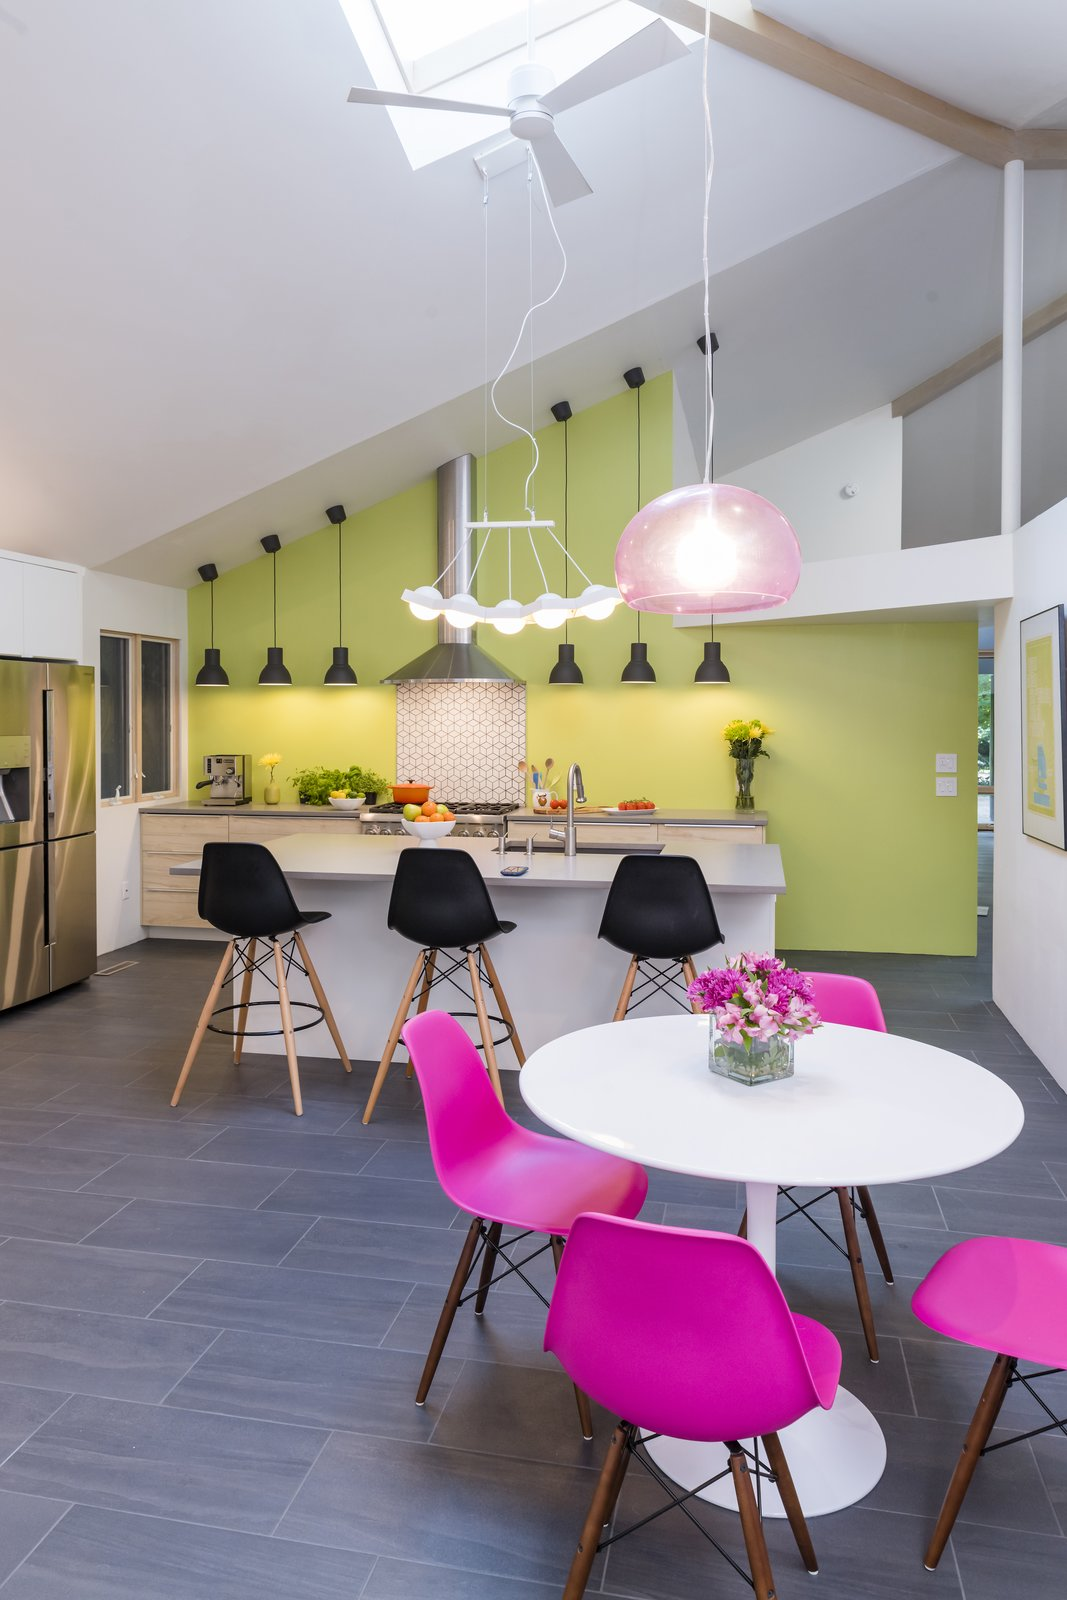 Kitchen, Porcelain Tile Floor, White Cabinet, Engineered Quartz Counter, Range Hood, Undermount Sink, Ceramic Tile Backsplashe, Ceiling Lighting, Wood Cabinet, Refrigerator, and Range  The Garden Path 2.0 by Jennifer Ott